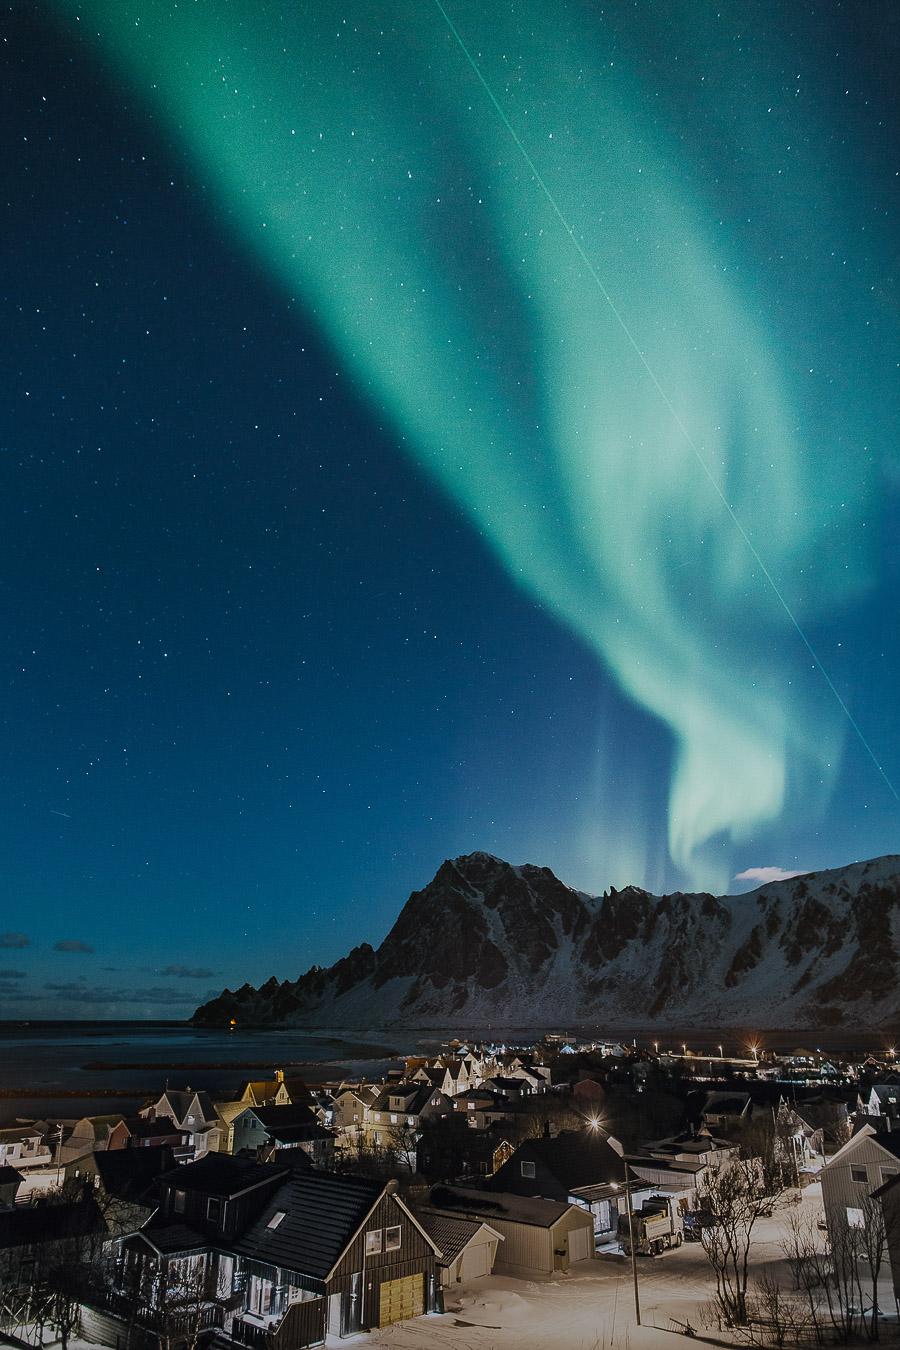 Nortern lights dancing over Bleik on Andøya